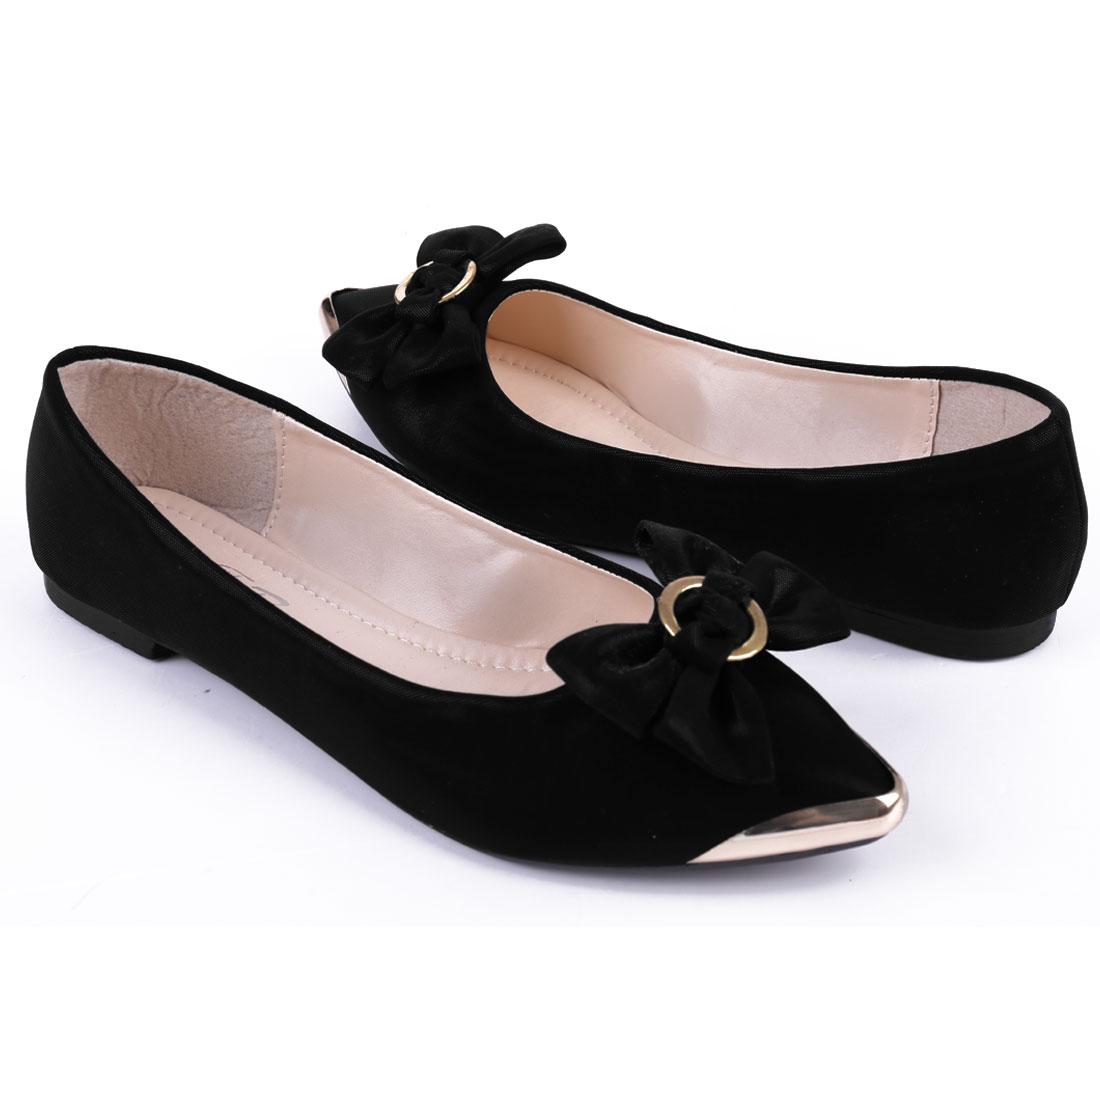 Women Small Rubber Heel Classic Lines Flats Black US 7.5